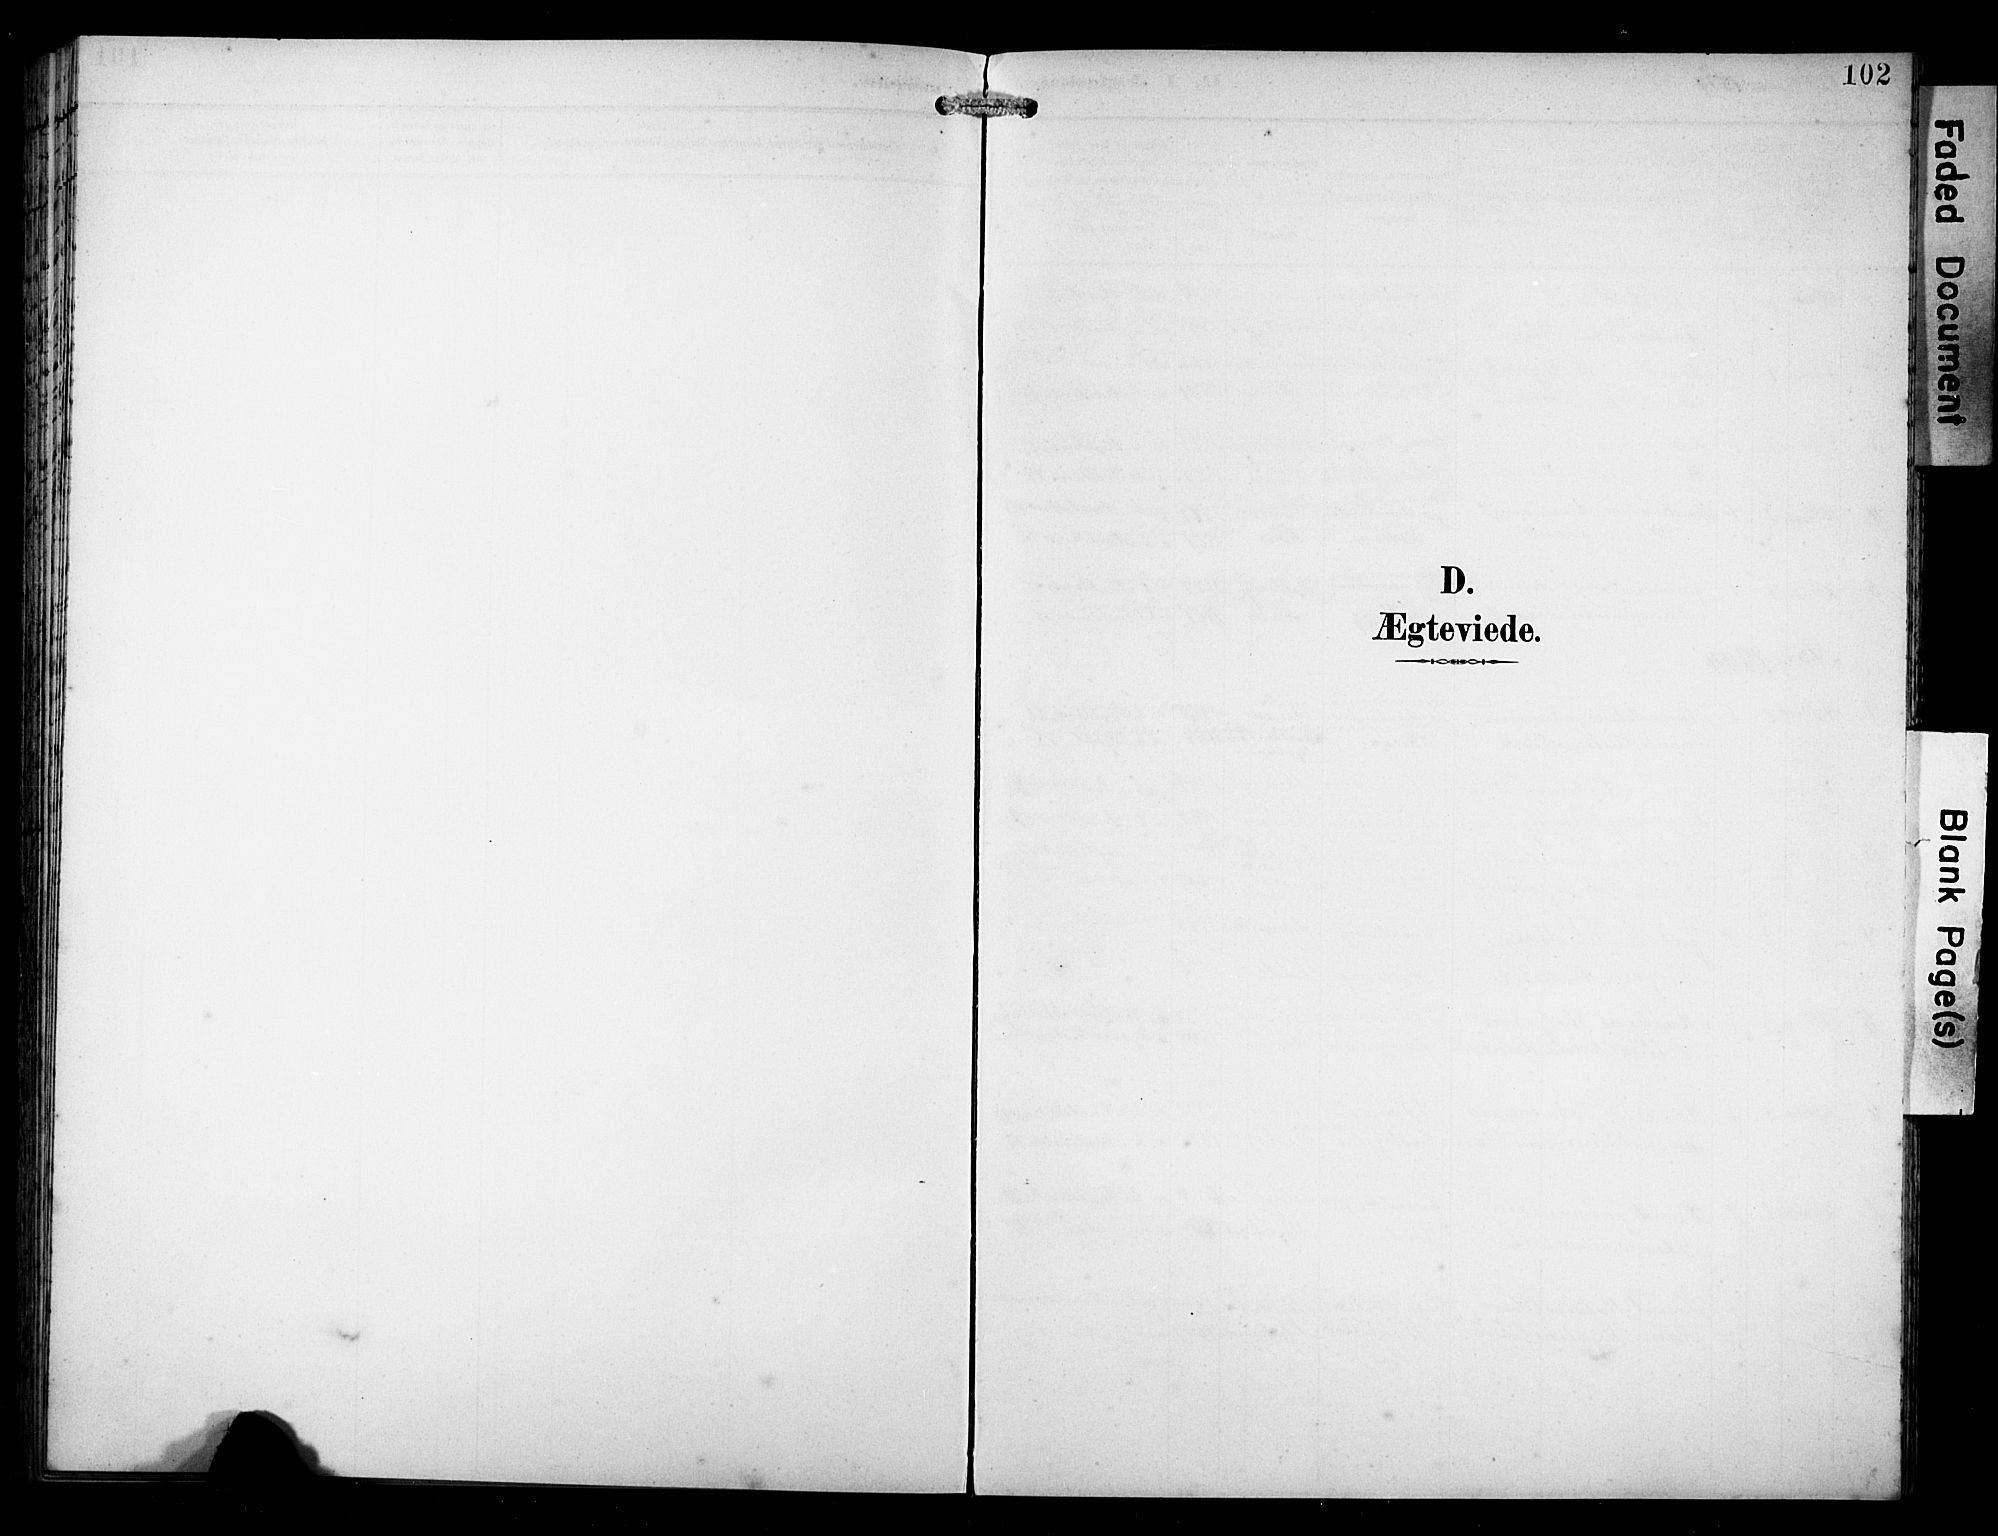 SAST, Avaldsnes sokneprestkontor, H/Ha/Hab/L0011: Klokkerbok nr. B 11, 1893-1929, s. 102